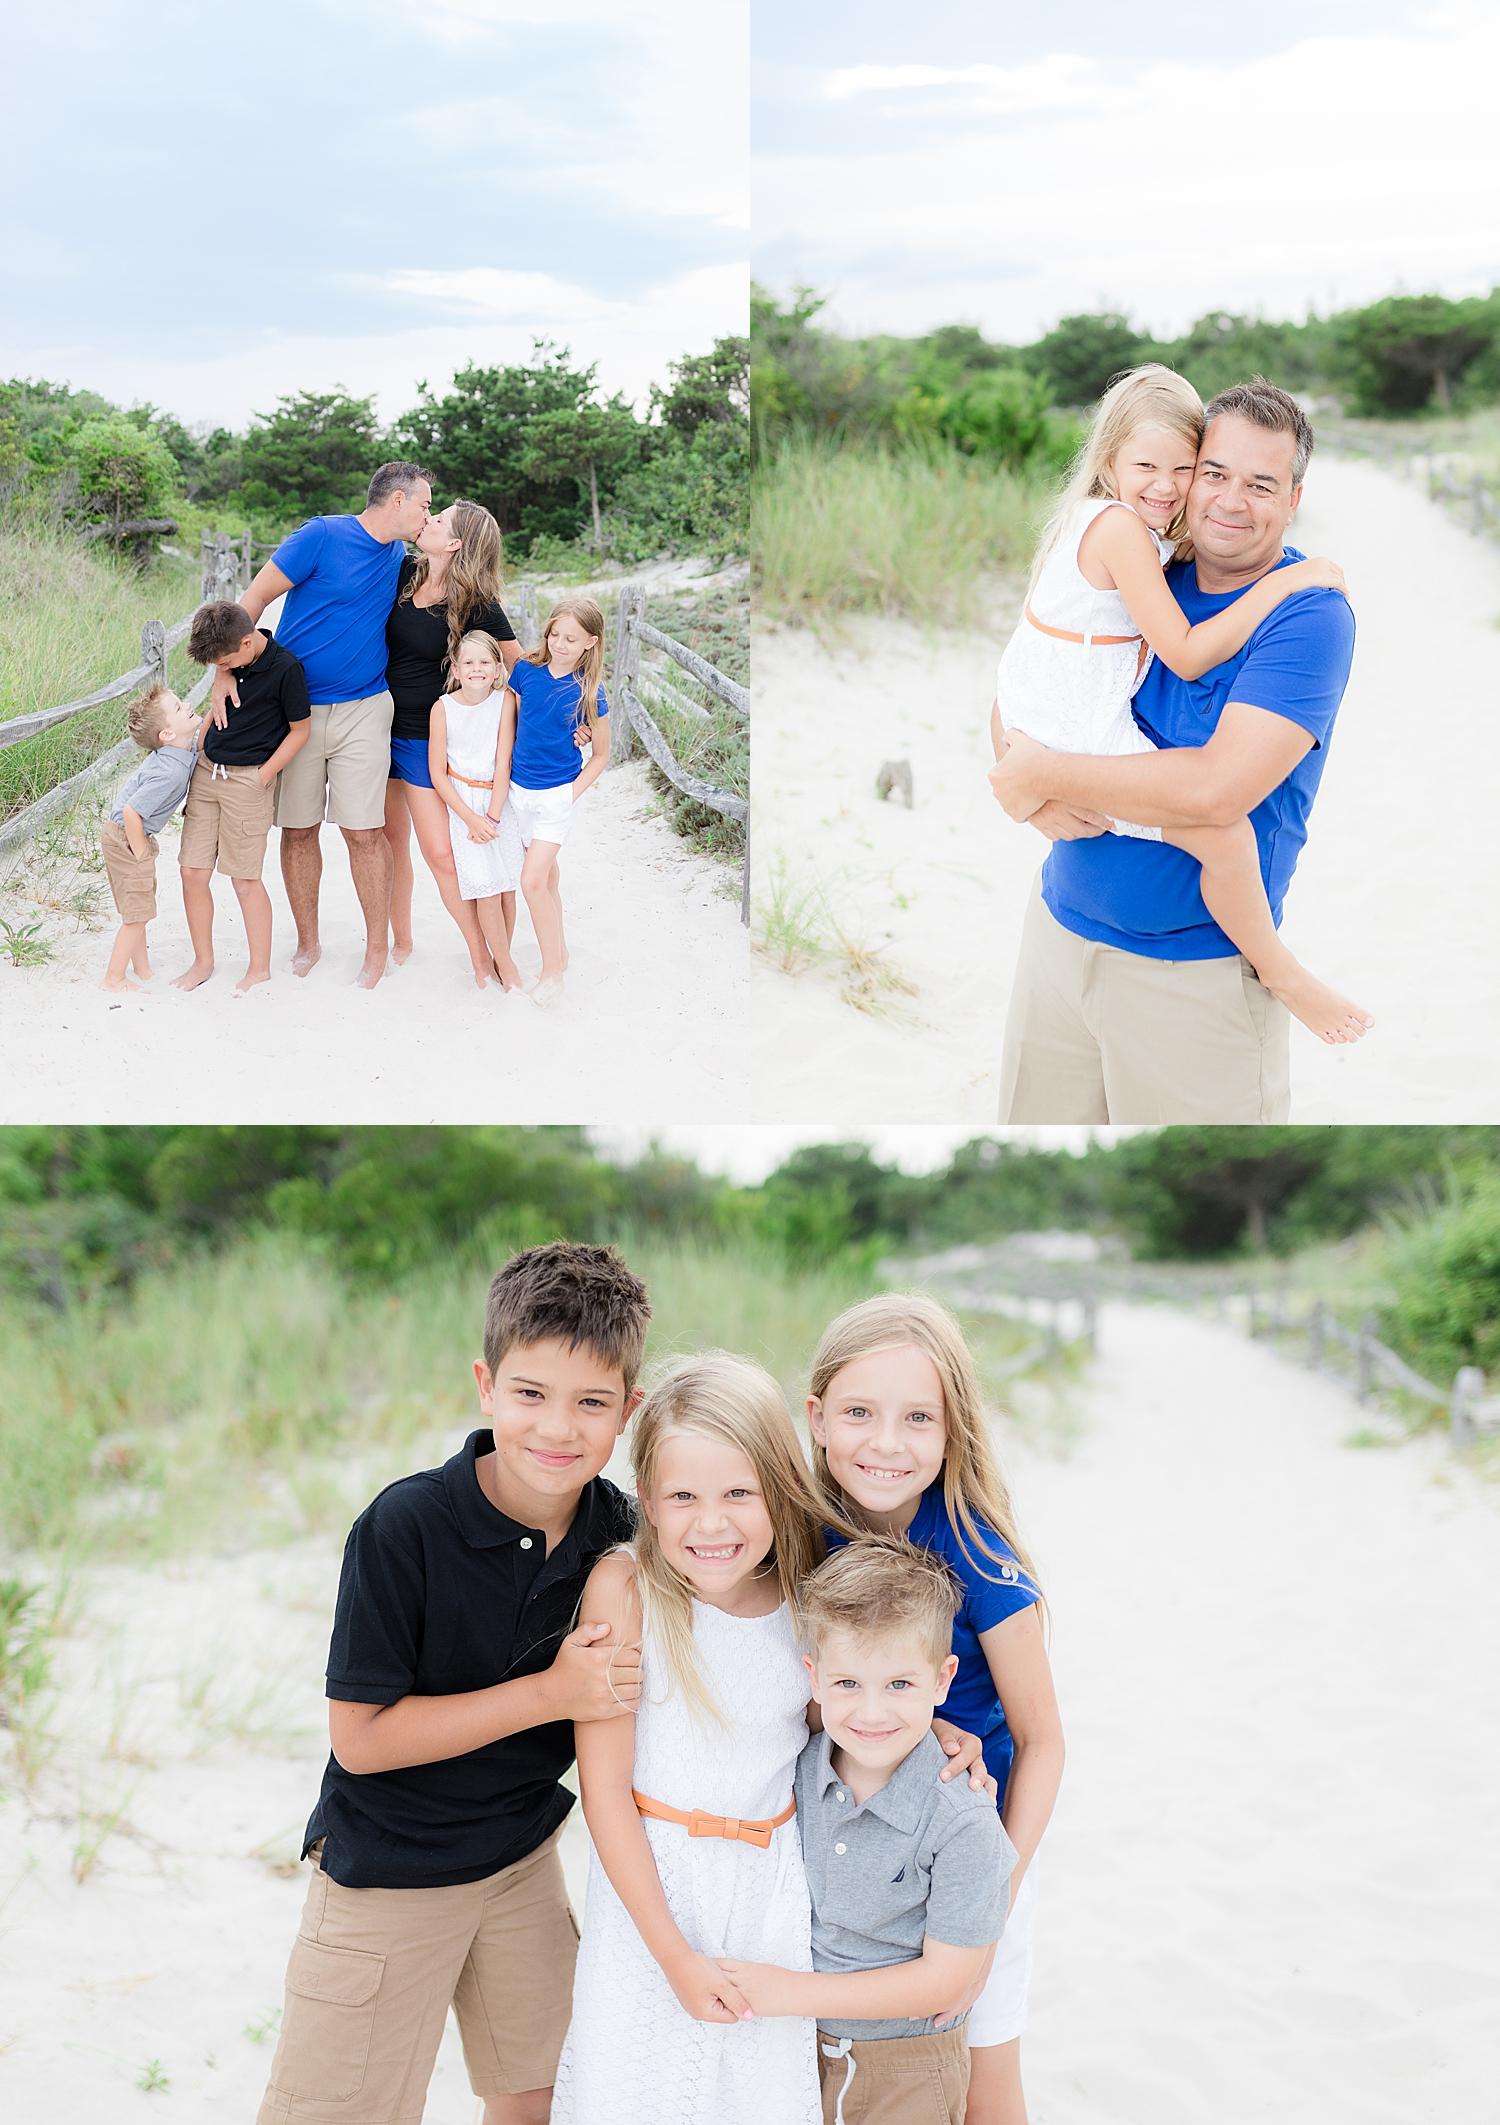 jersey shore family beach photo portrait